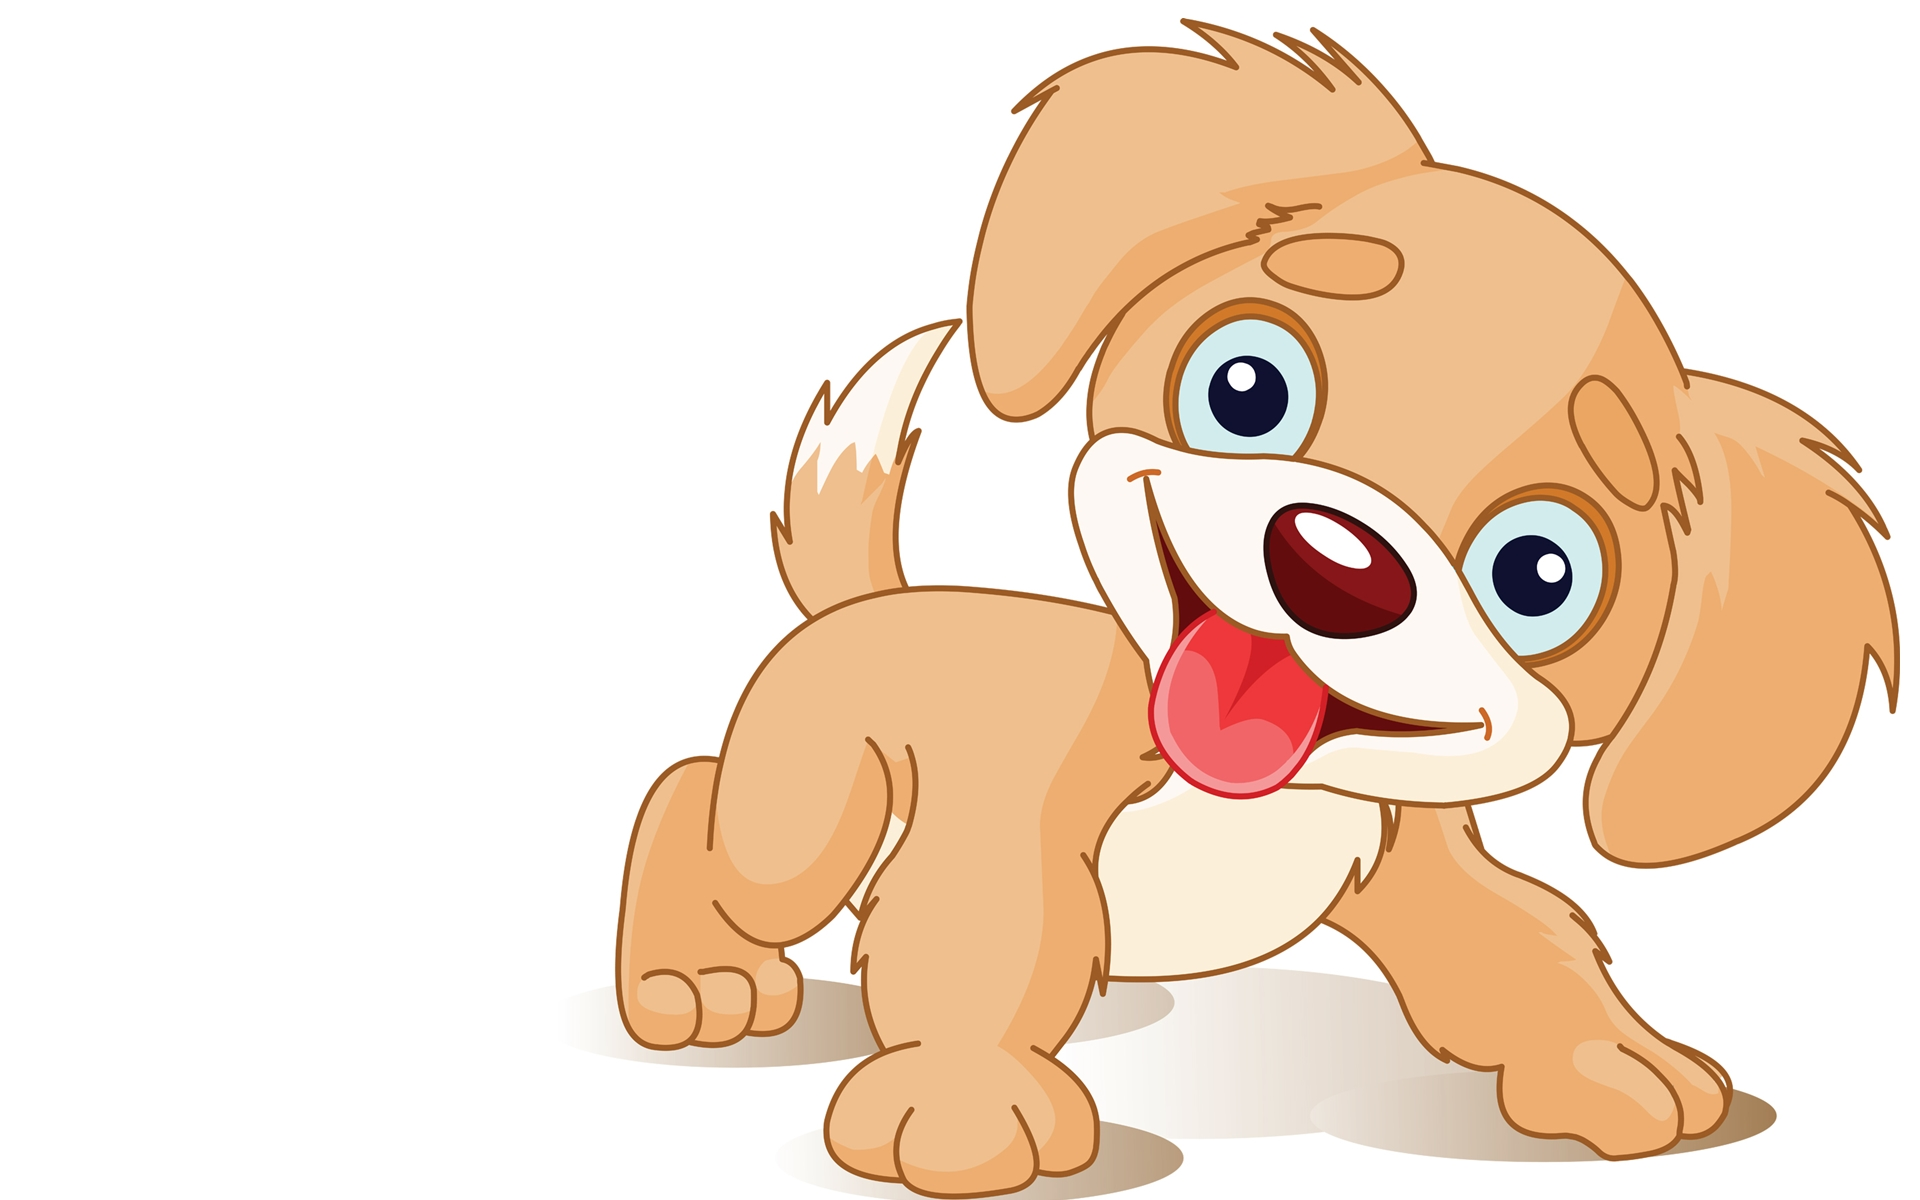 dog happy cartoon wallpaper | 1920x1200 | #9205